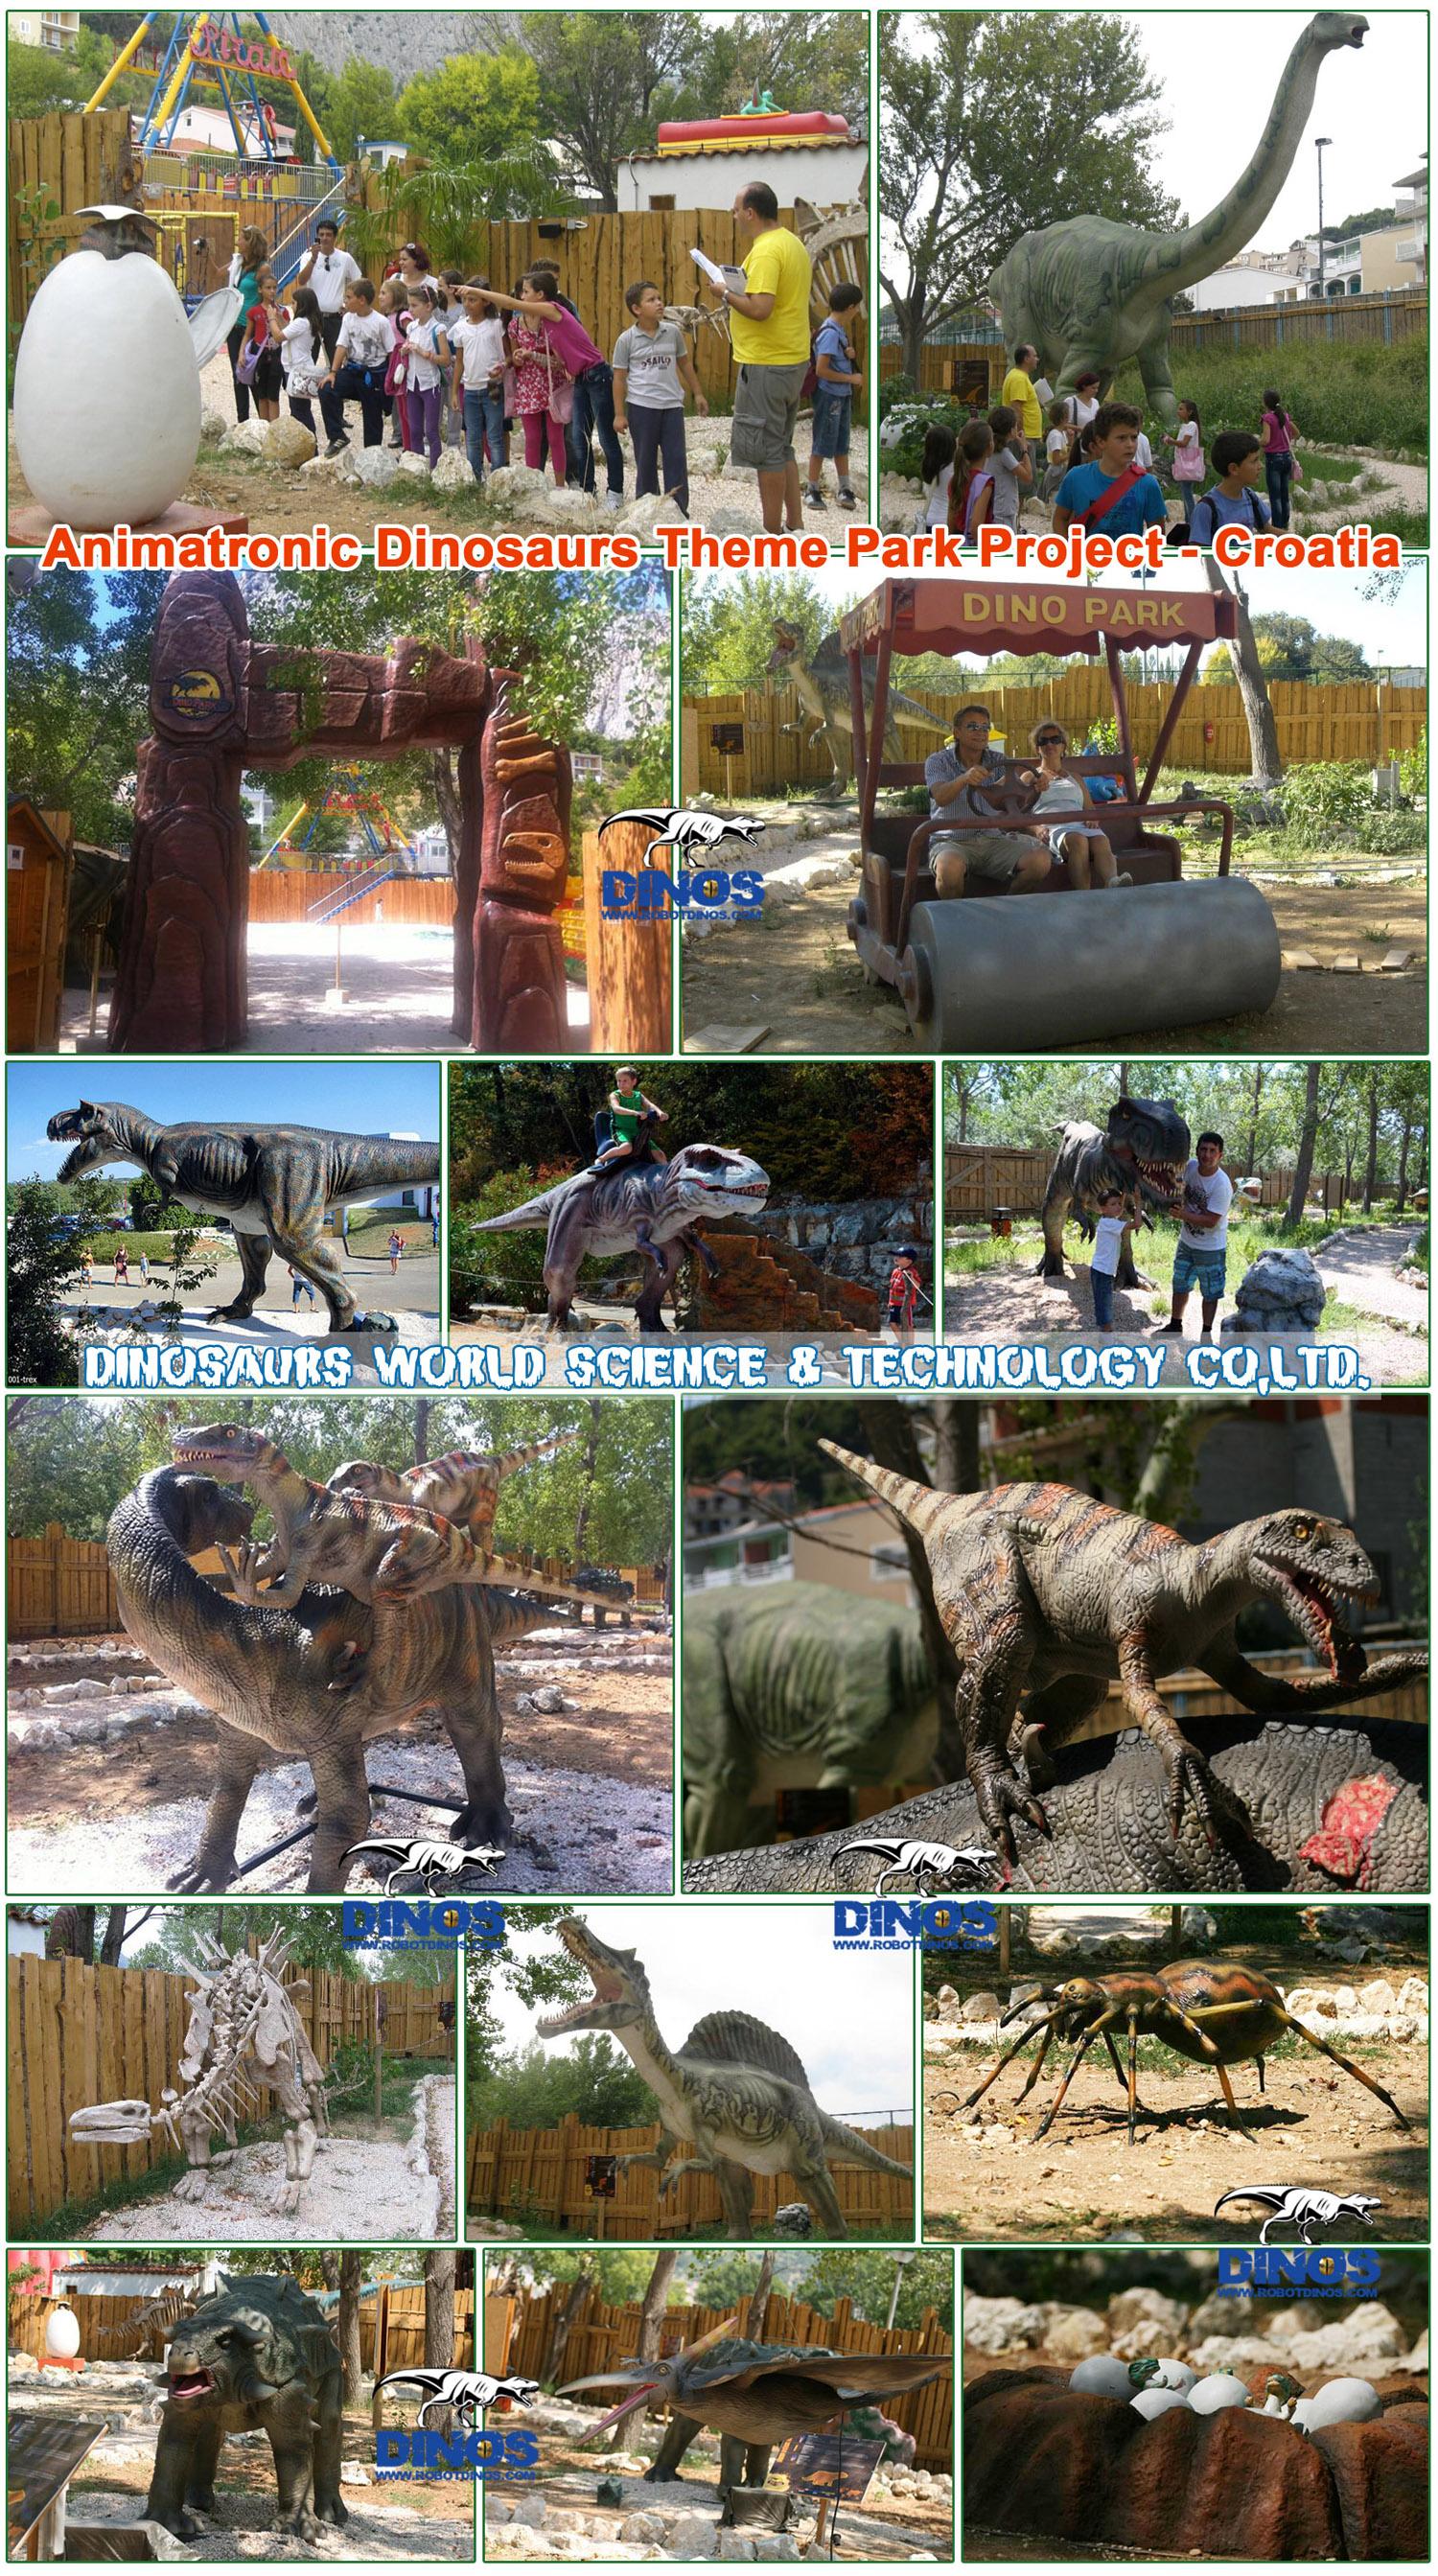 jurassic park dinosaur,theme park attraction,theme park dinosaurs,theme park equipment,amusement park equipment,attraction event